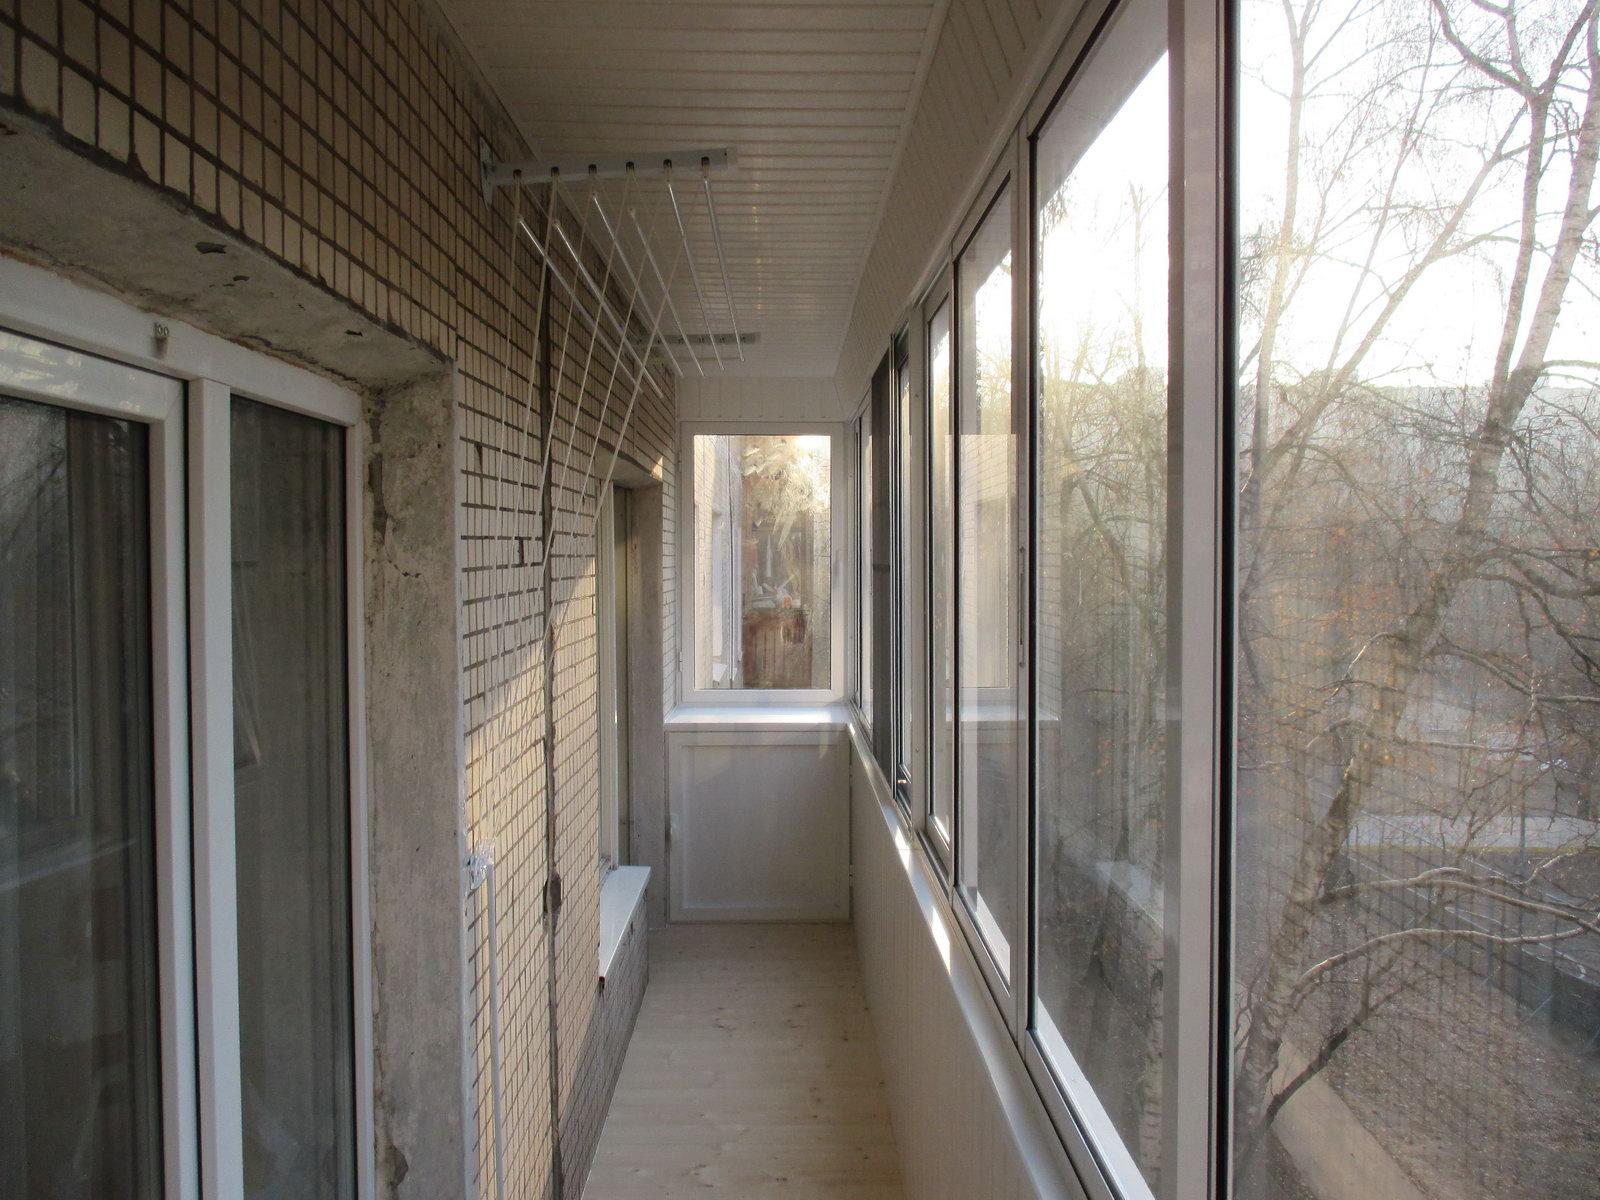 Мастера: остекление балконов и лоджий, дмитров, мужчина - ма.